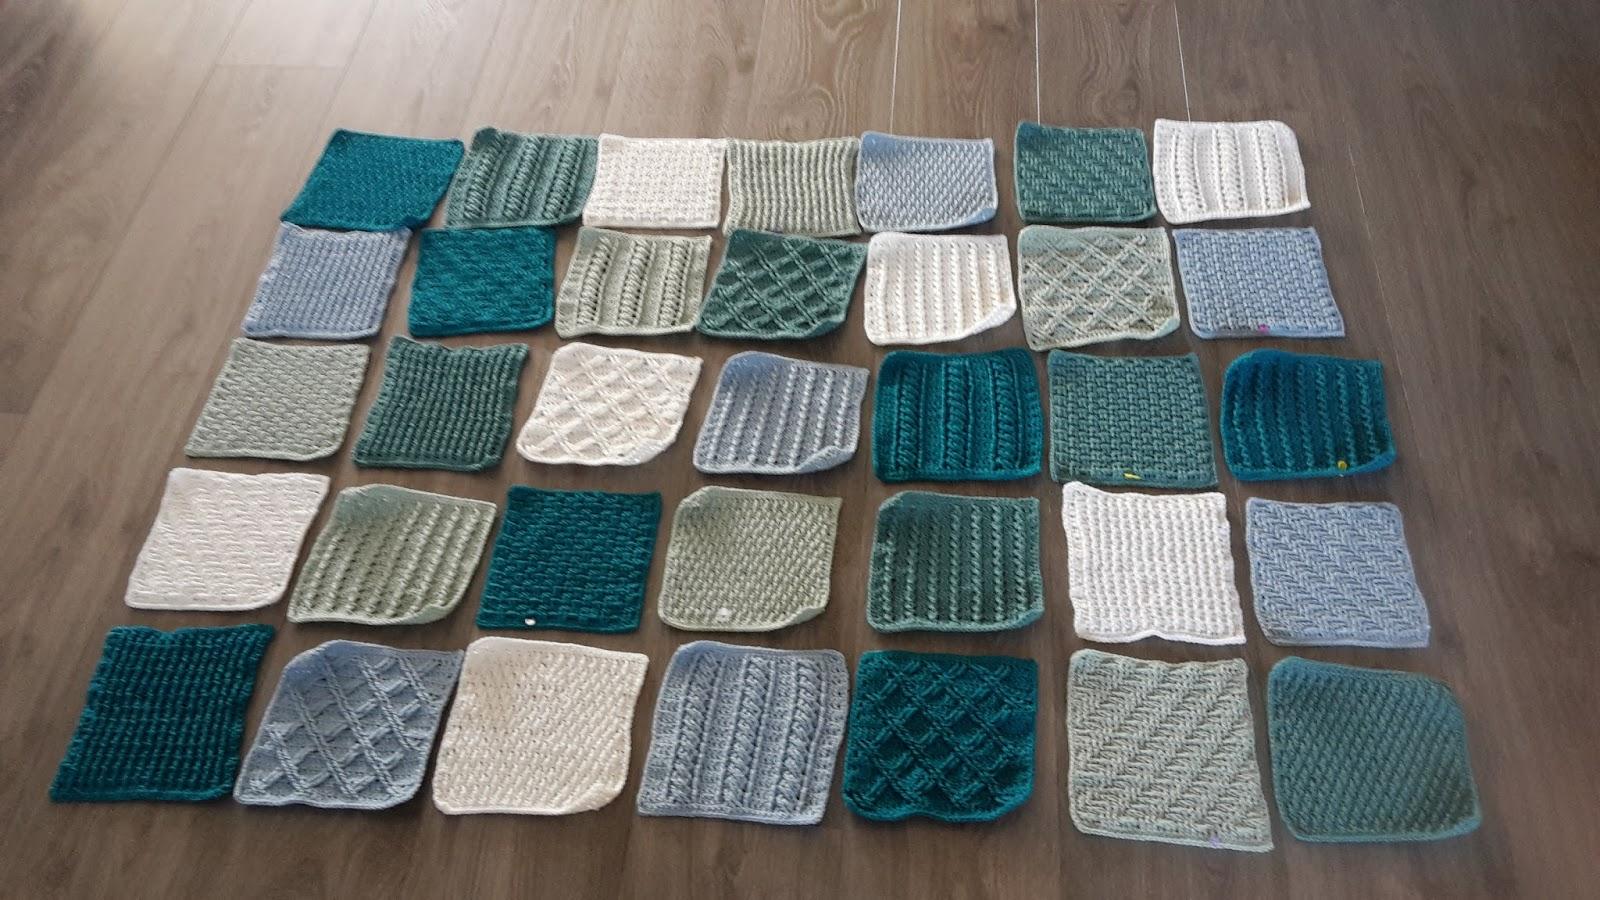 Knutsels Van Jolanda Cosy Woondekens Crochet Along Deel 8 Cosy